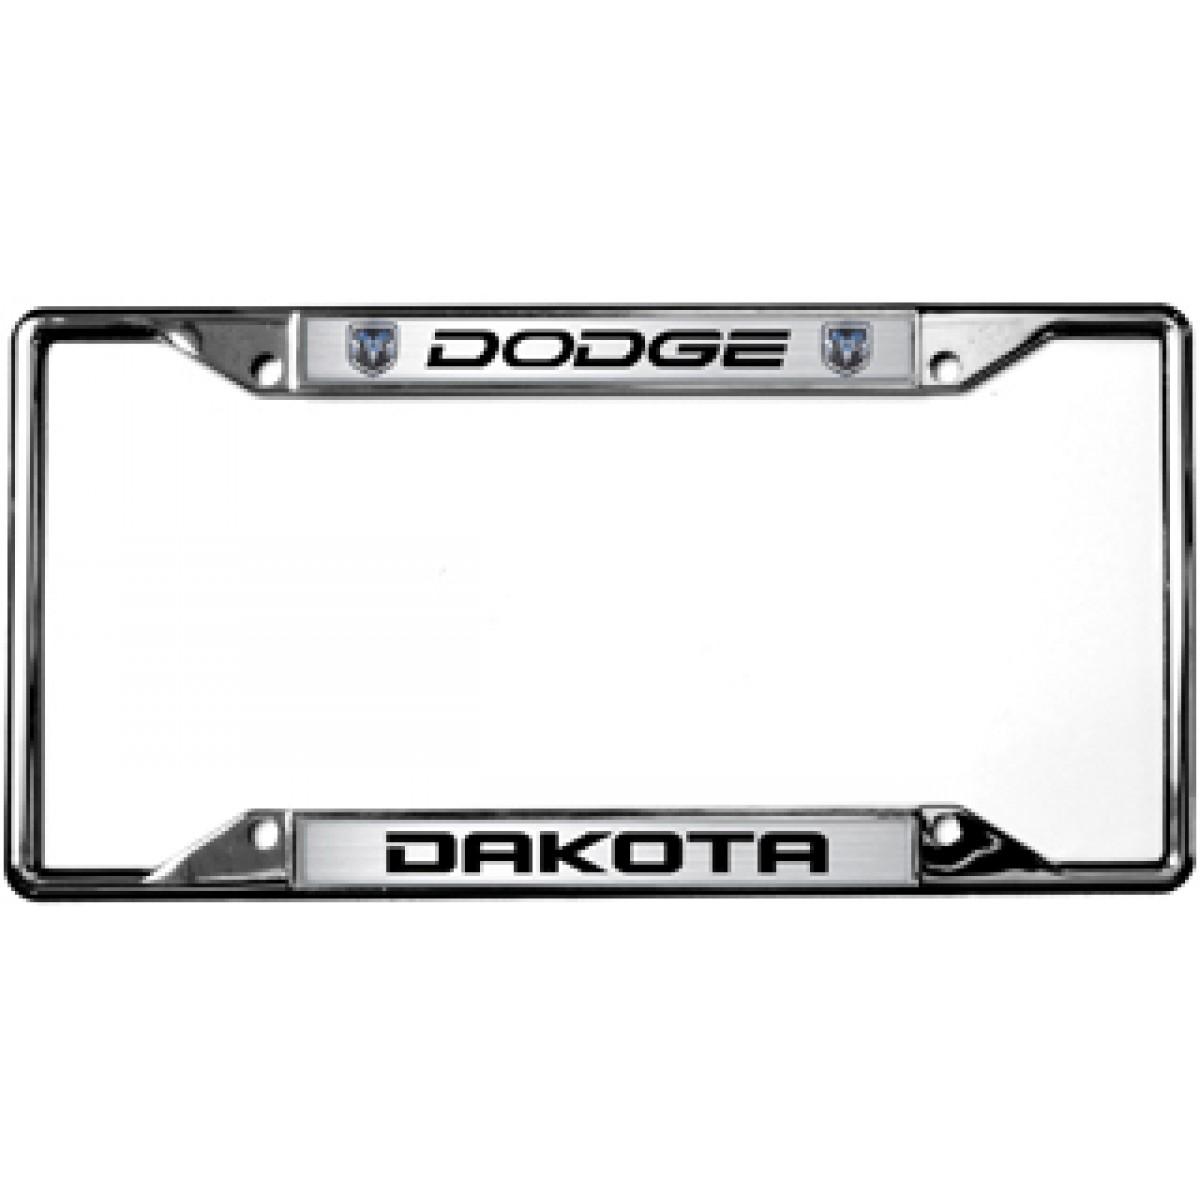 dodge dakota license plate frame - Dodge License Plate Frame